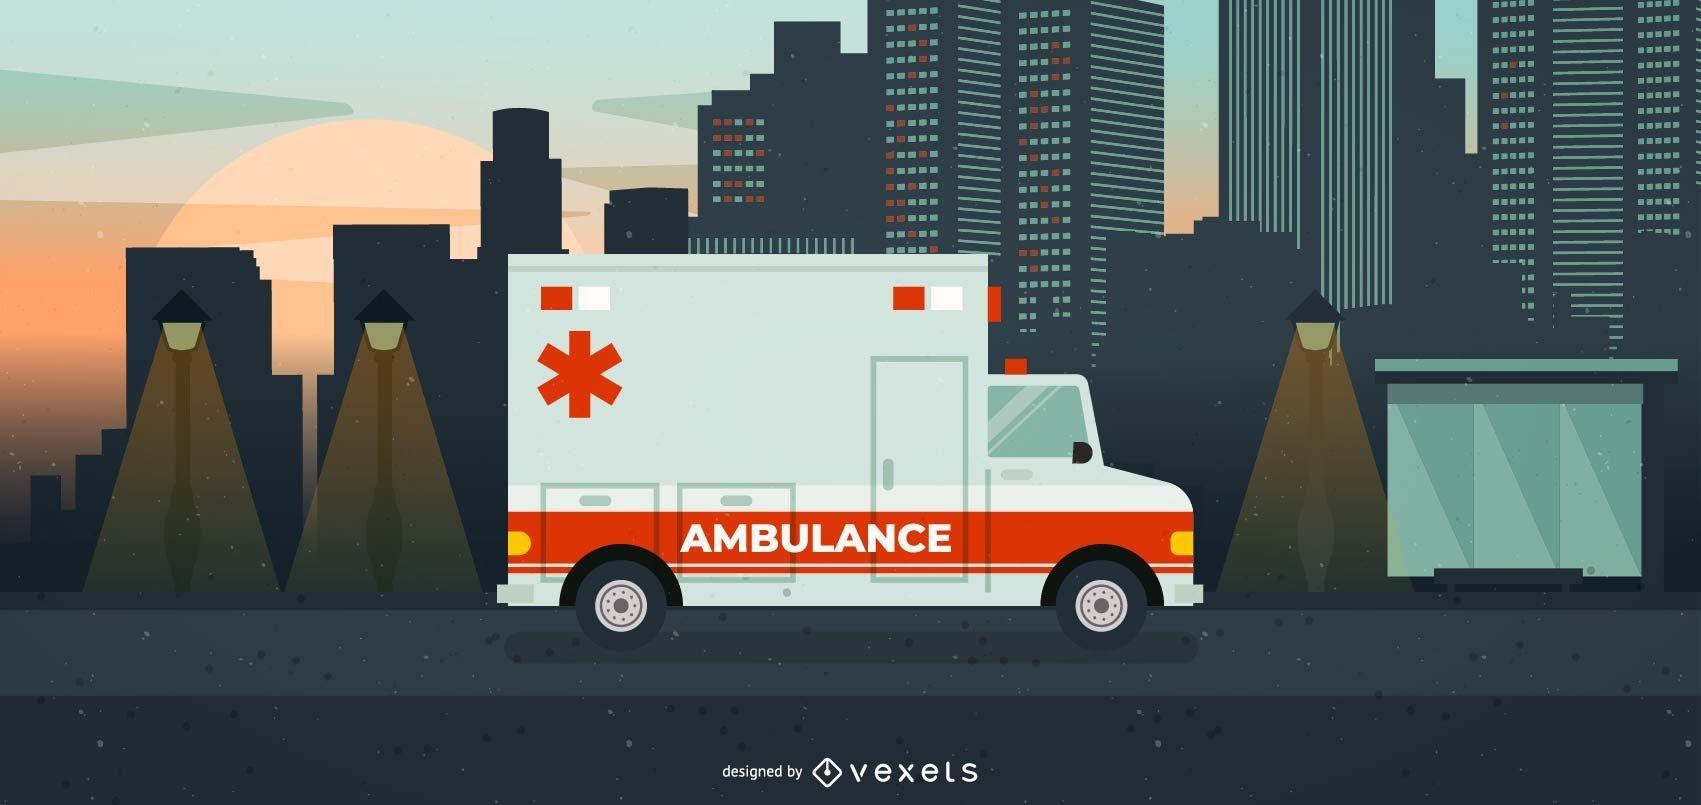 Big Hospital Ambulance Illustration